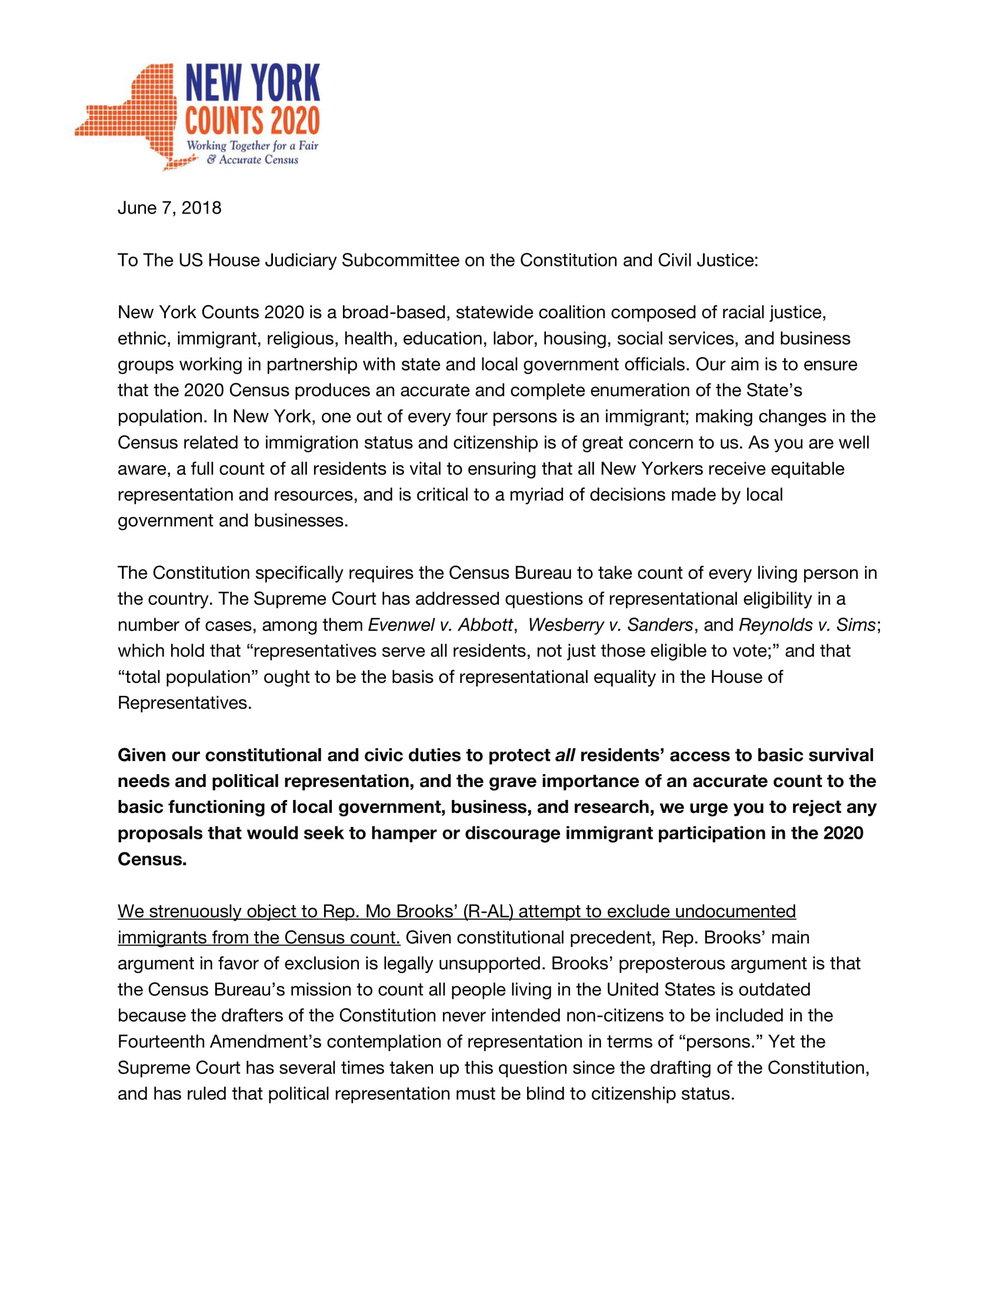 NYCounts_JudiciarySubCommittee_June7-1.jpg